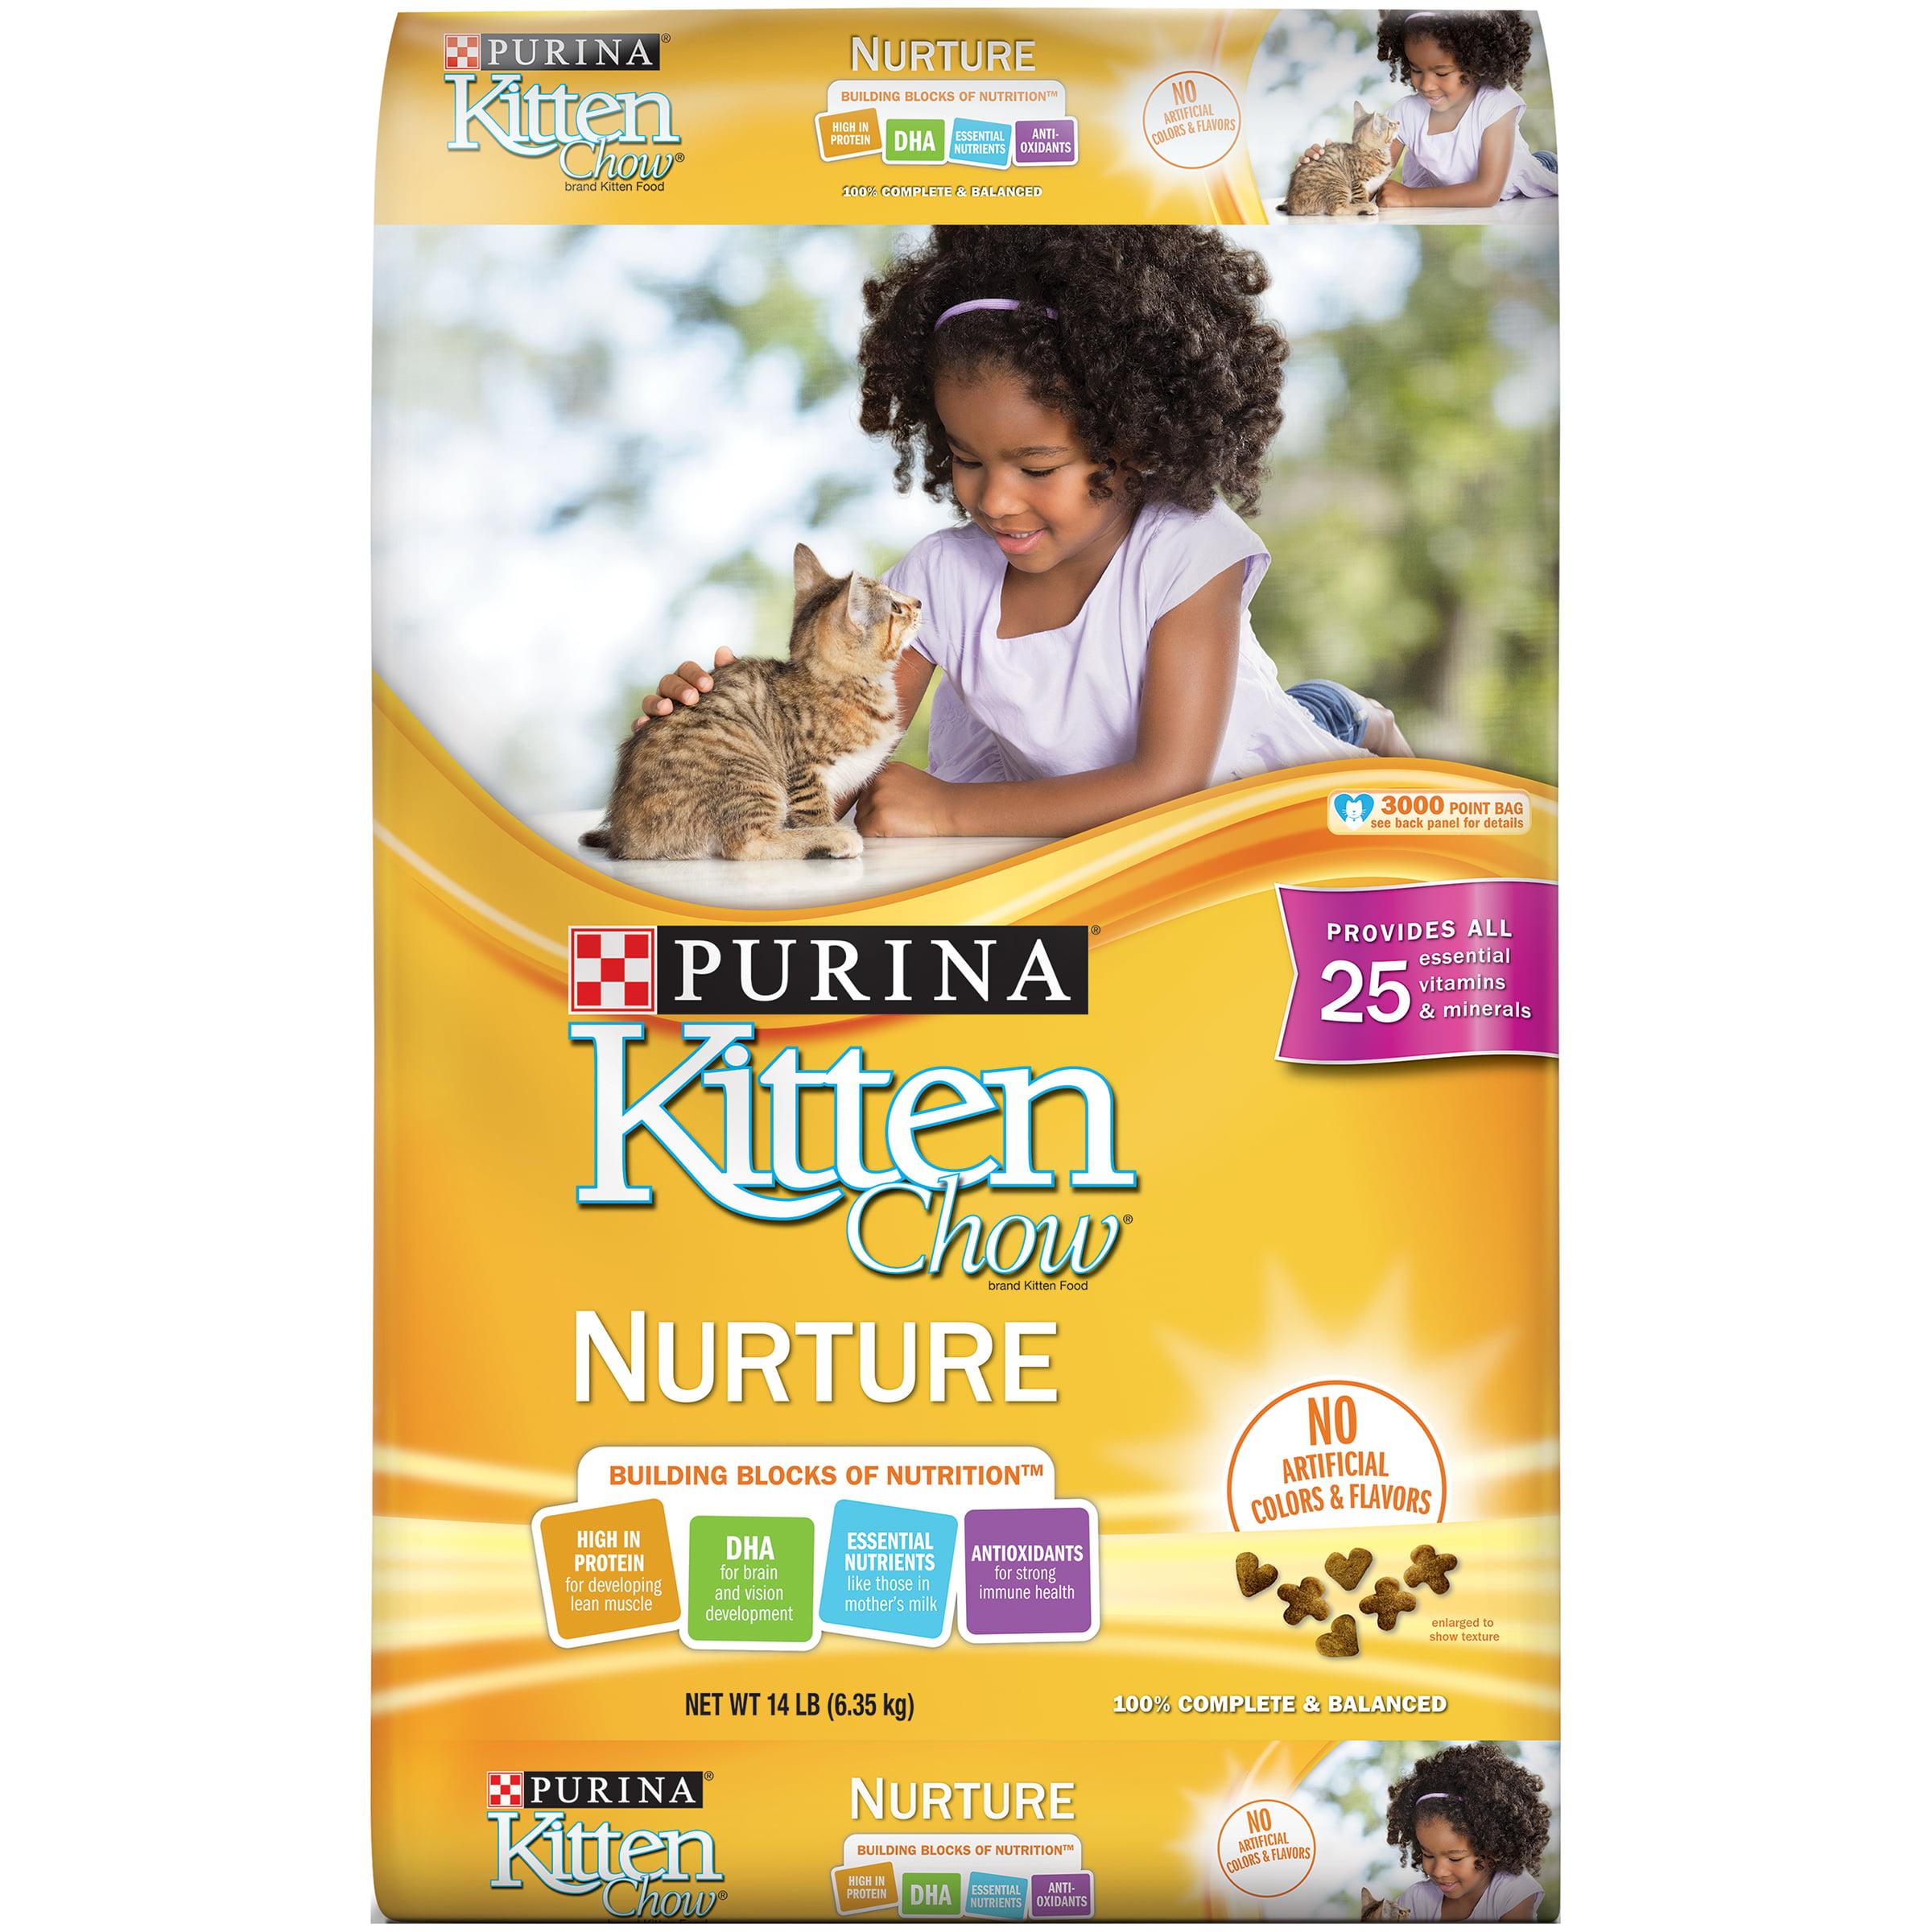 Purina Kitten Chow Nurture Dry Cat Food, 14 Lb